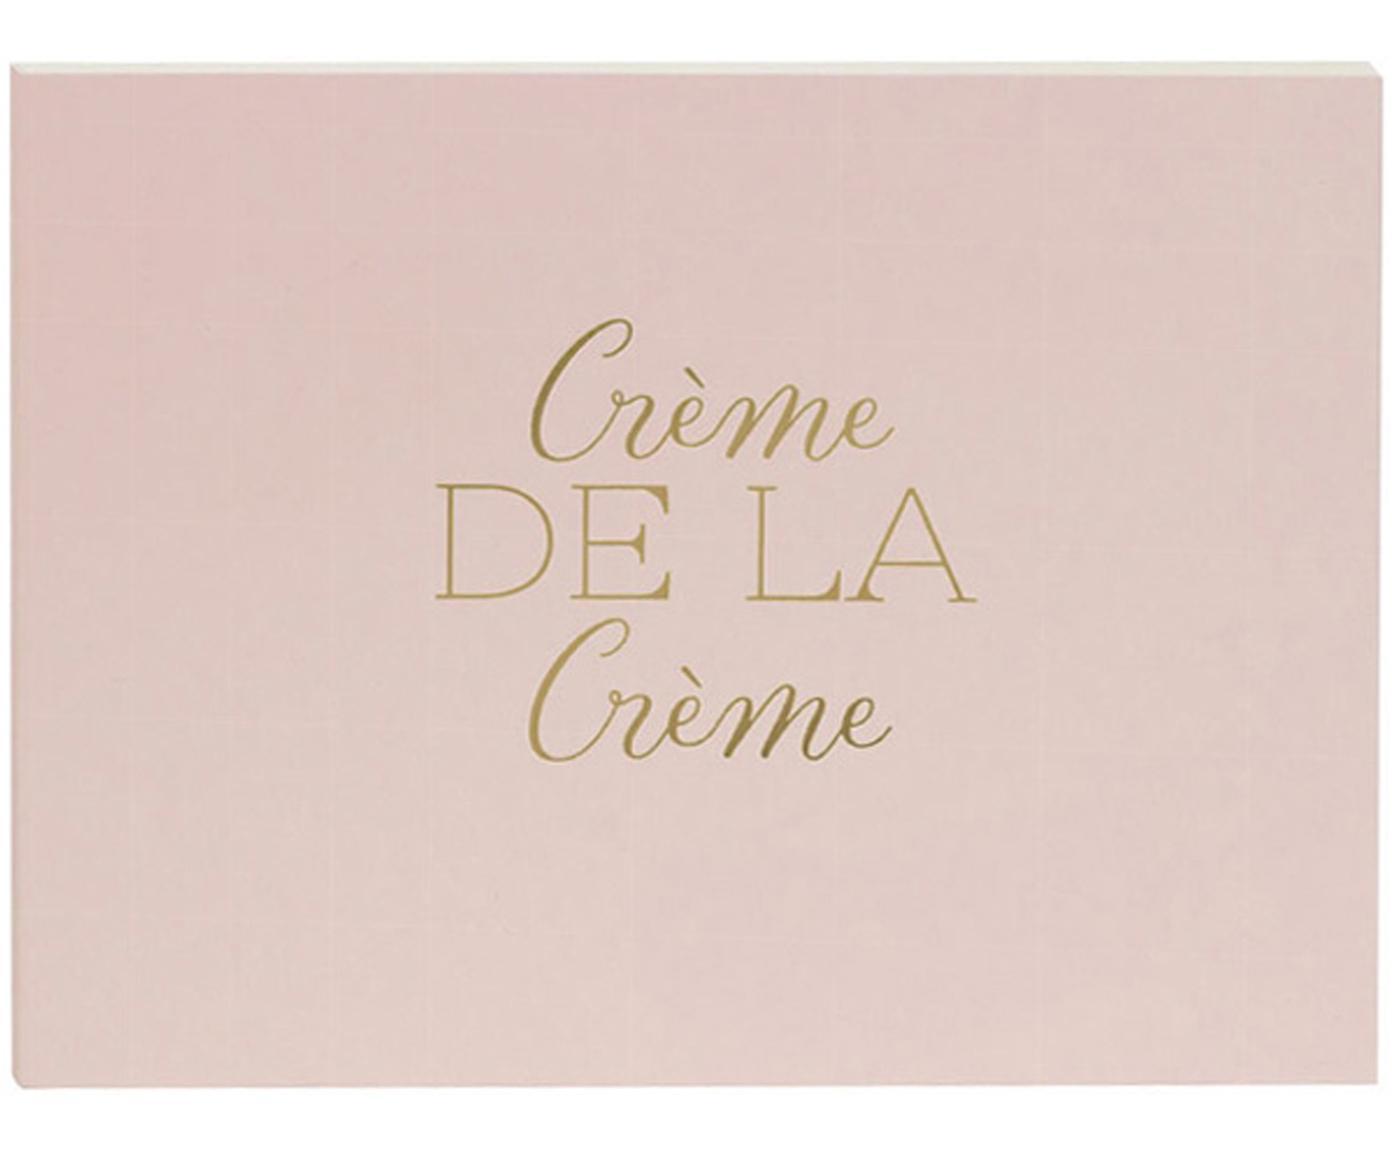 Gastenboek Crème de la Crème, Roze, goudkleurig, 23 x 18 cm